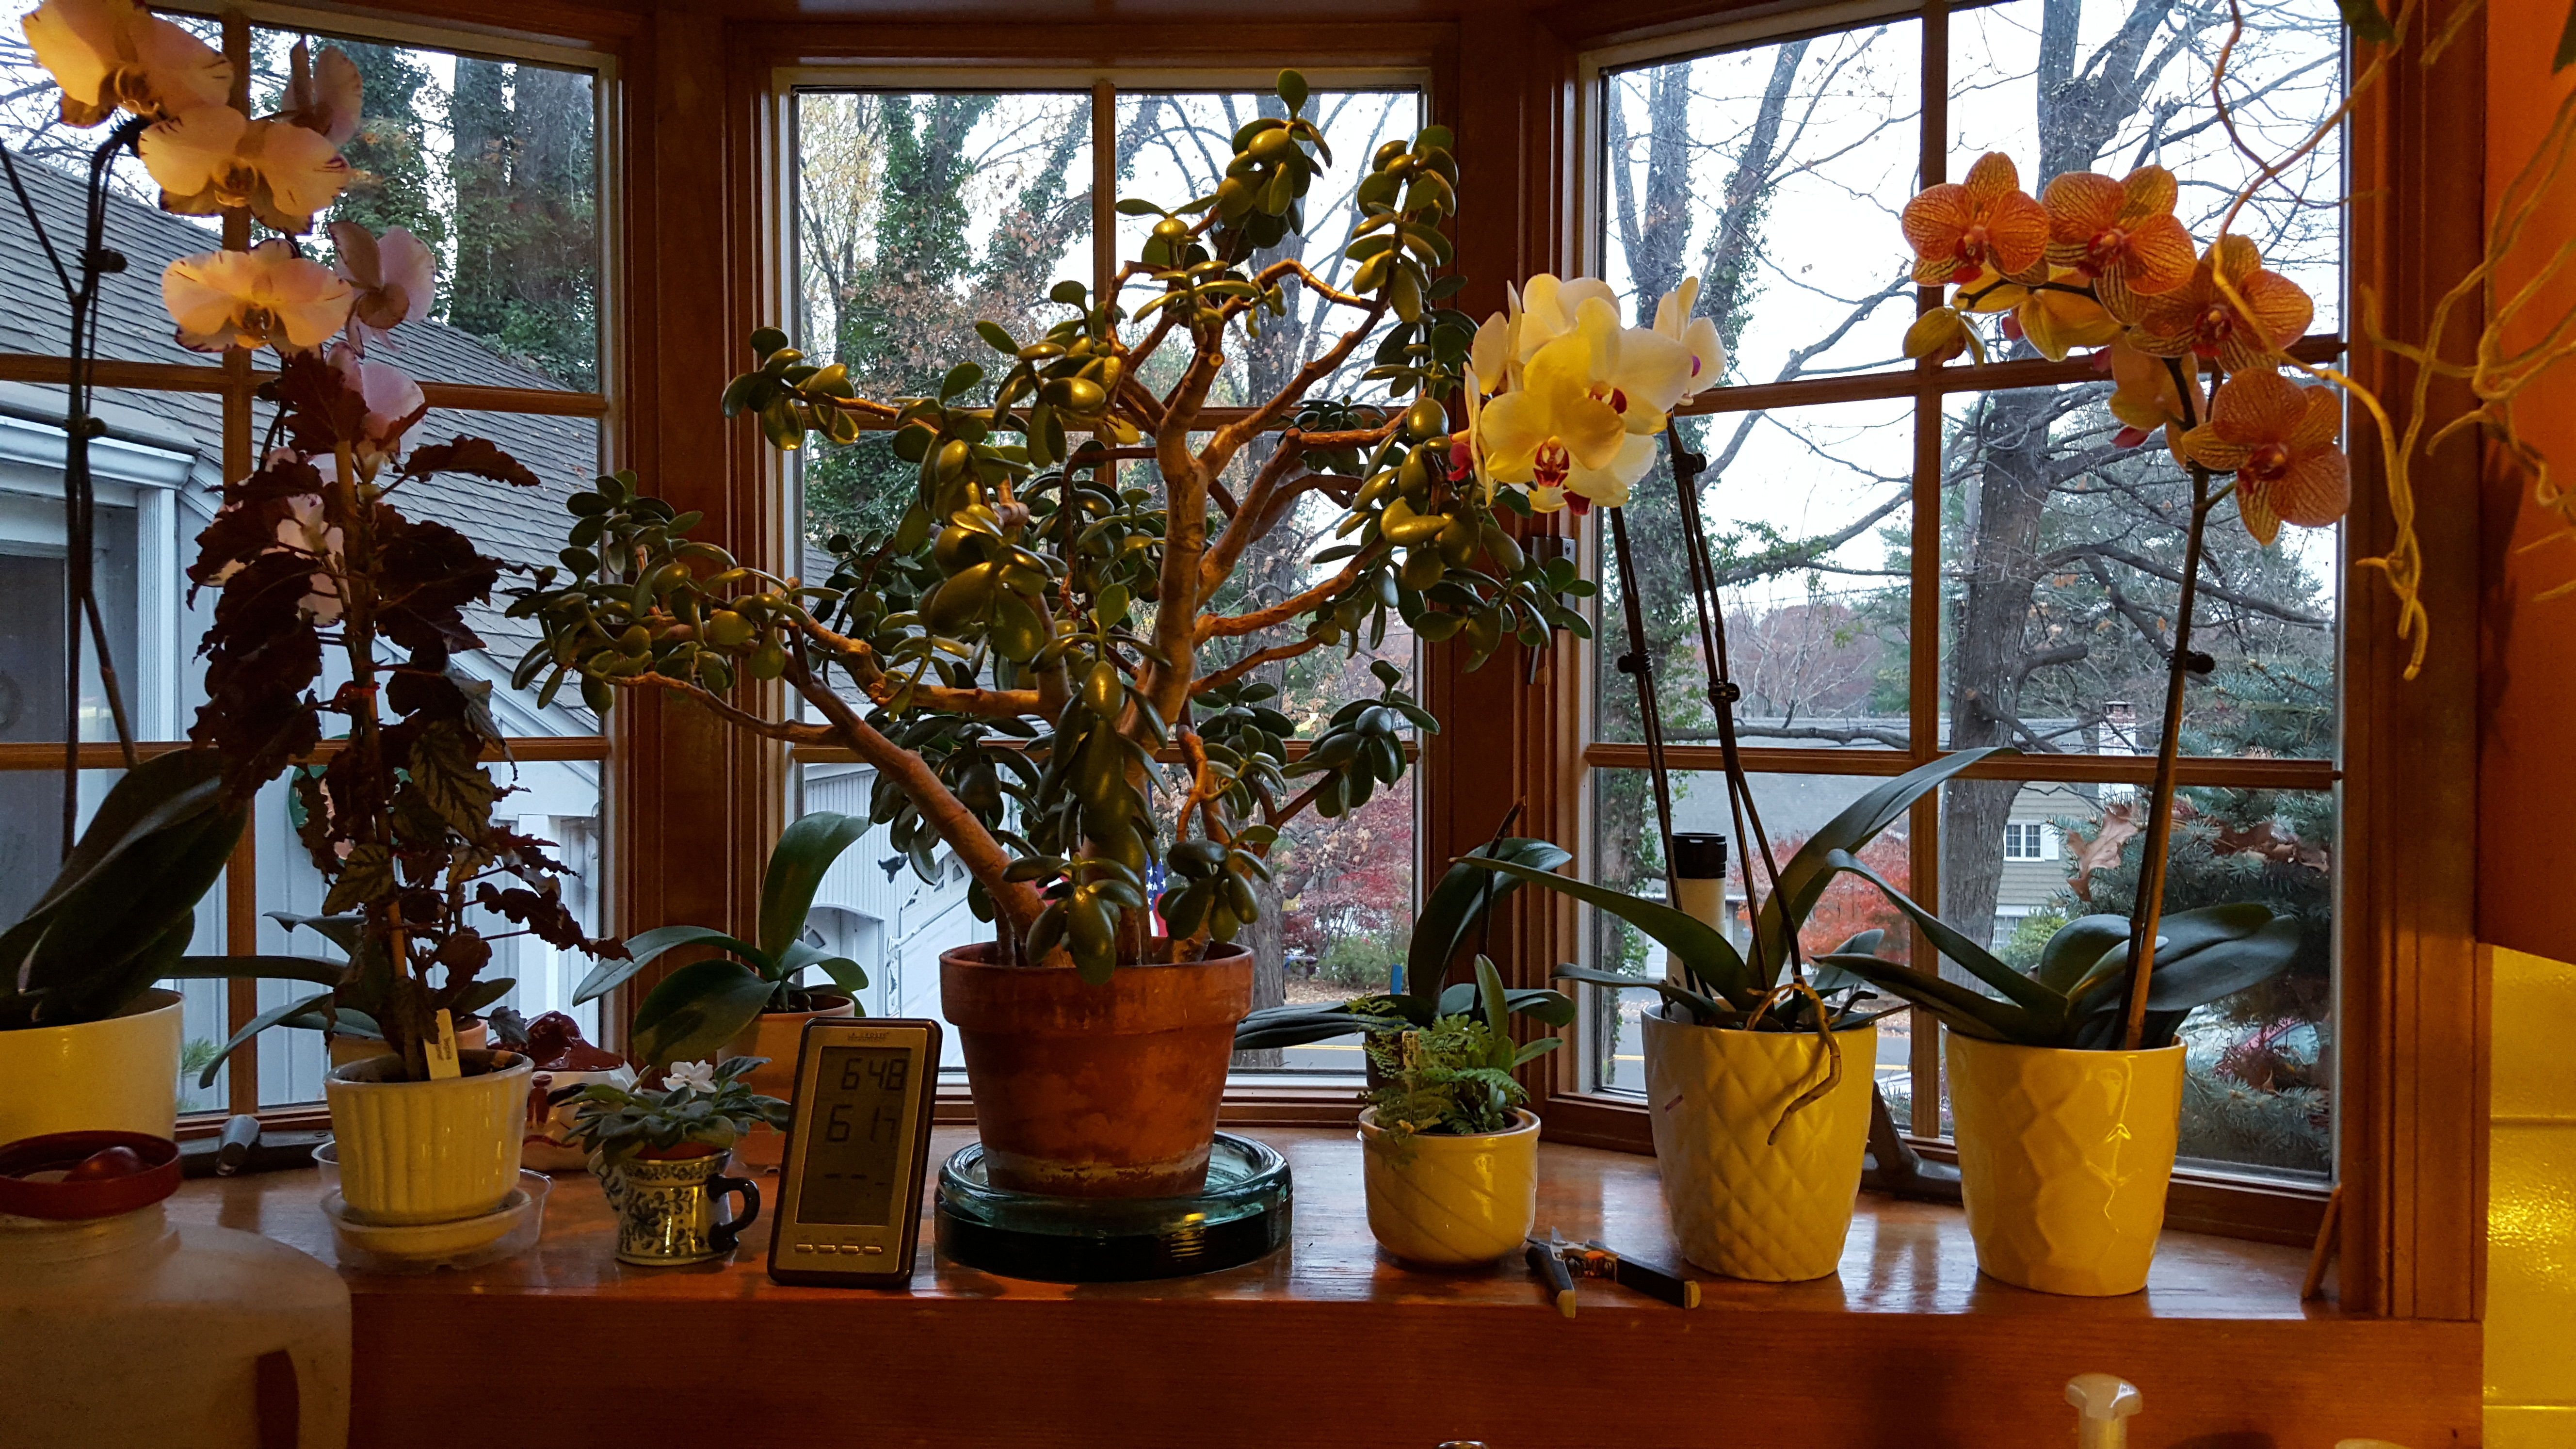 Easy Care Plants for an East Window – Gardendaze